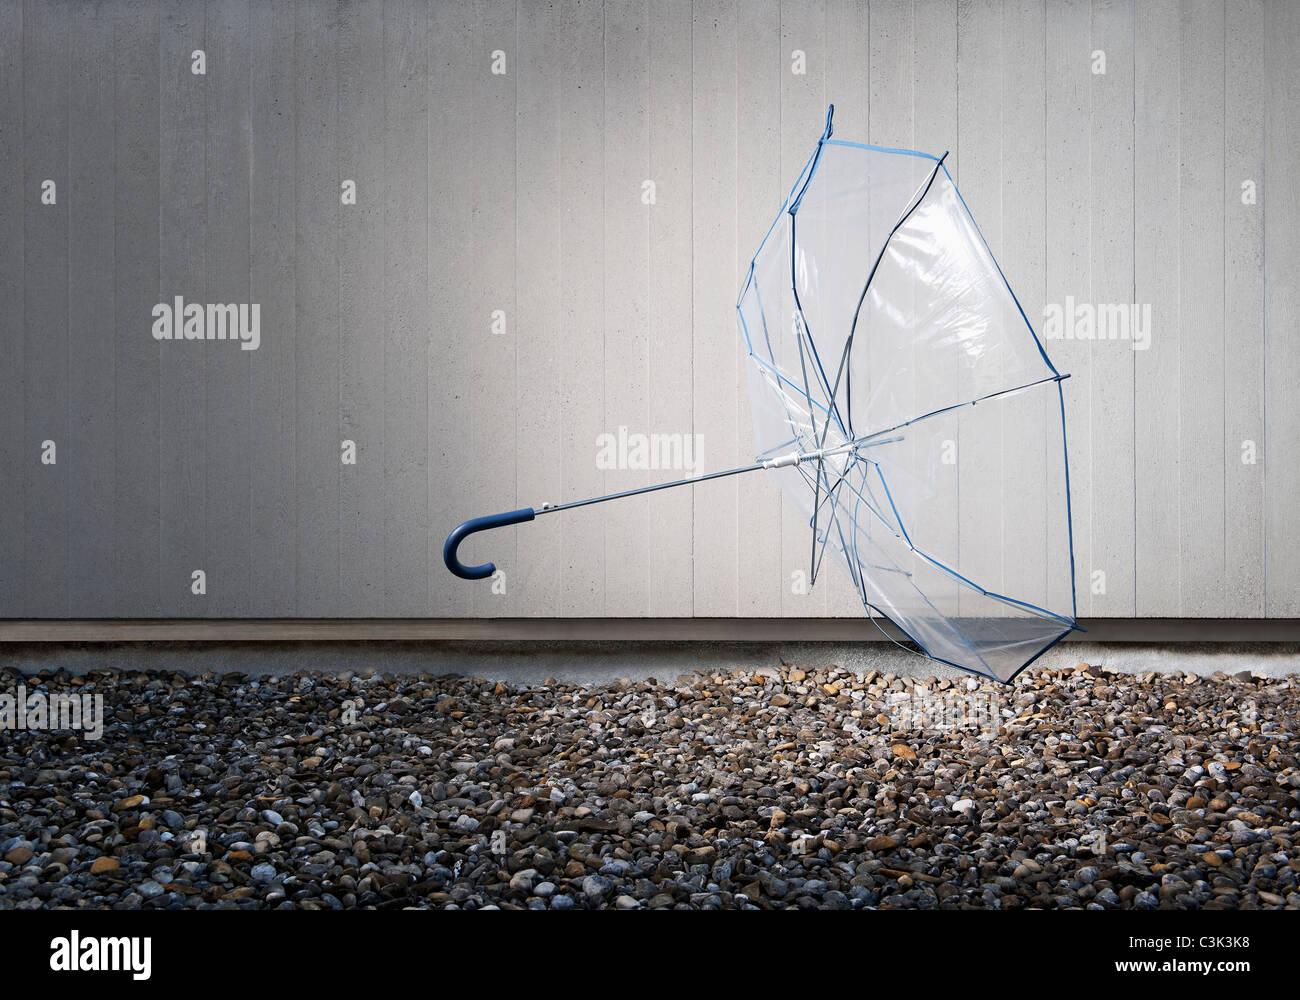 Transparent umbrella lying on ground - Stock Image